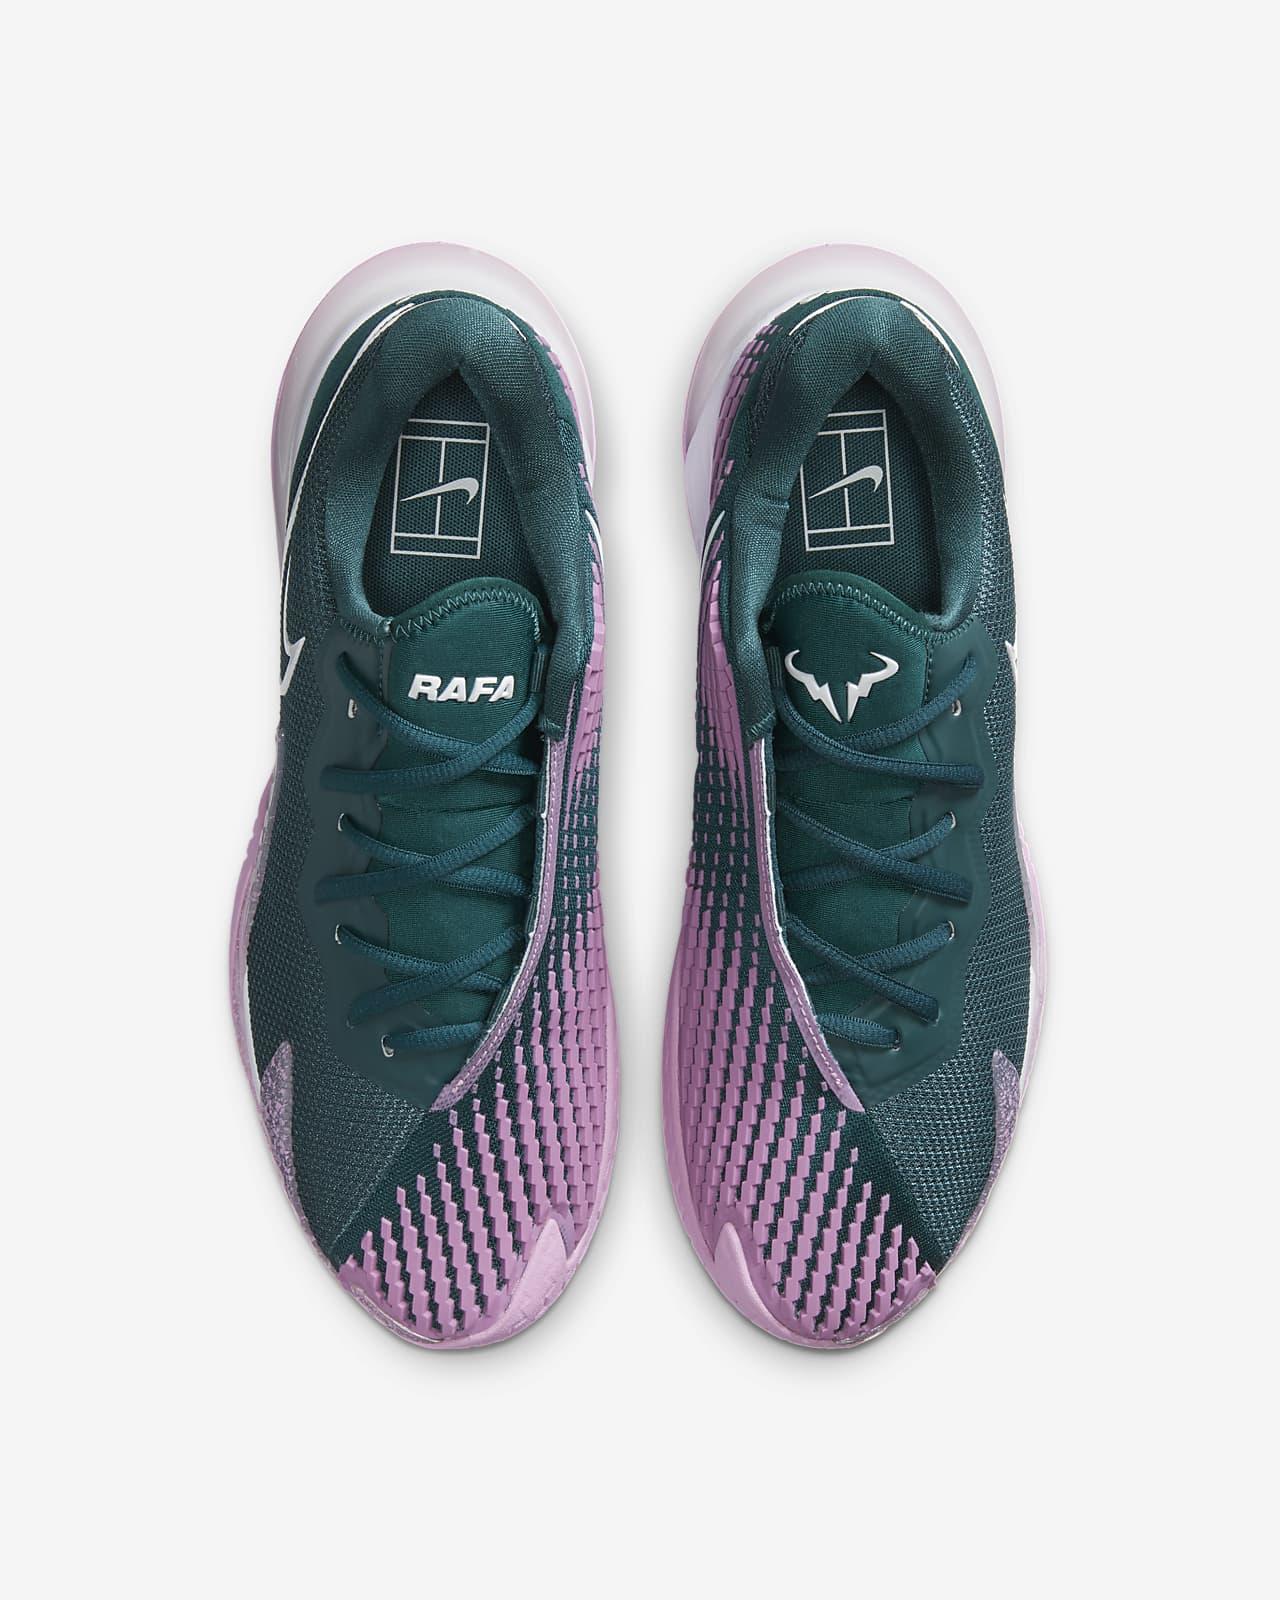 Alapos Megfázni Gonosz chaussures de tennis air max cage homme ...